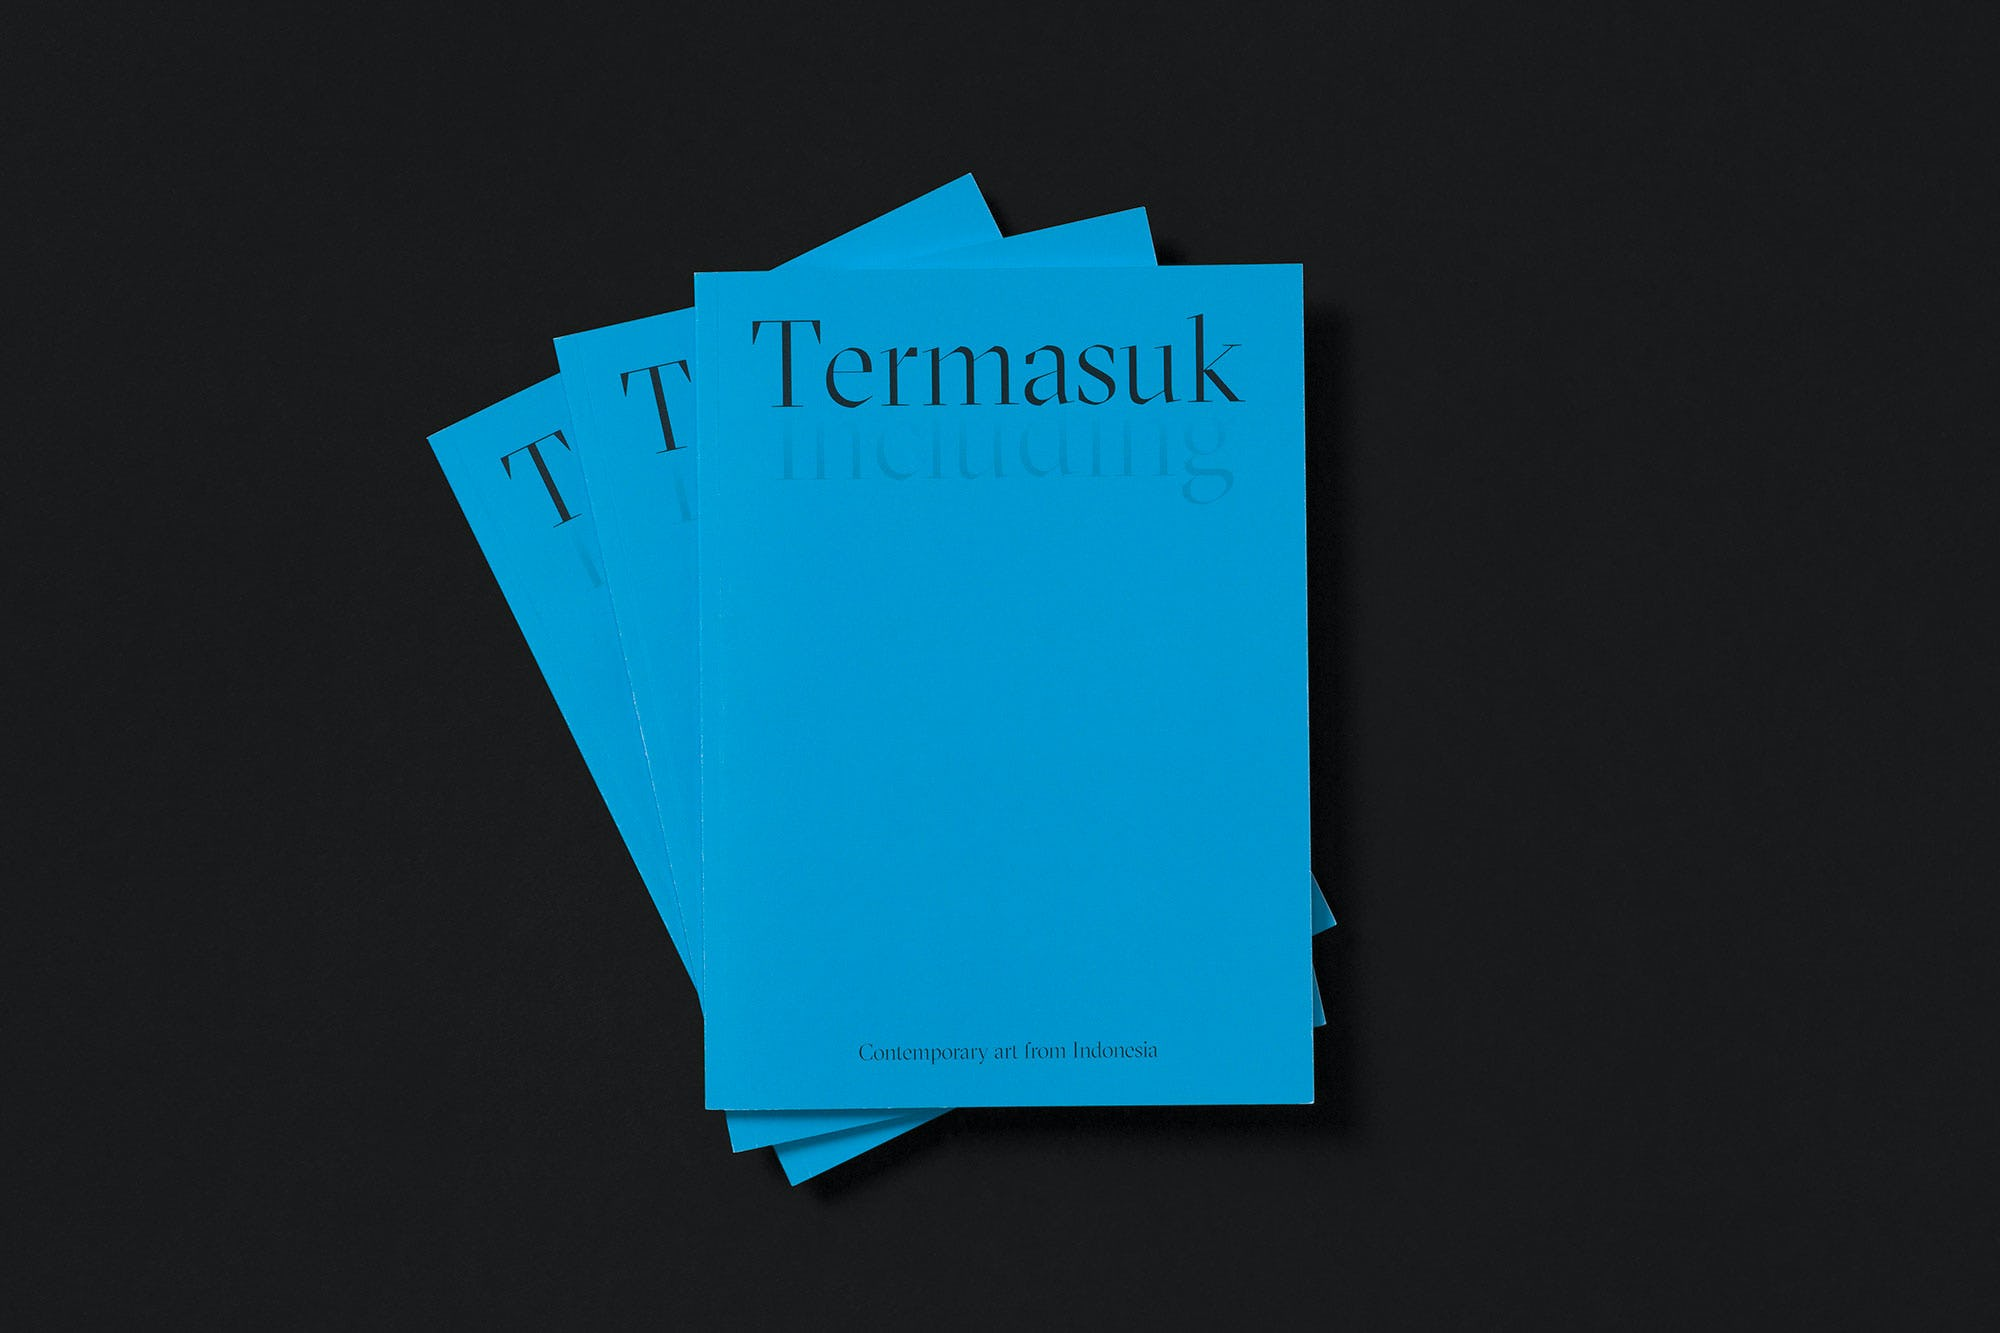 Three copies of the Termasuk catalogue